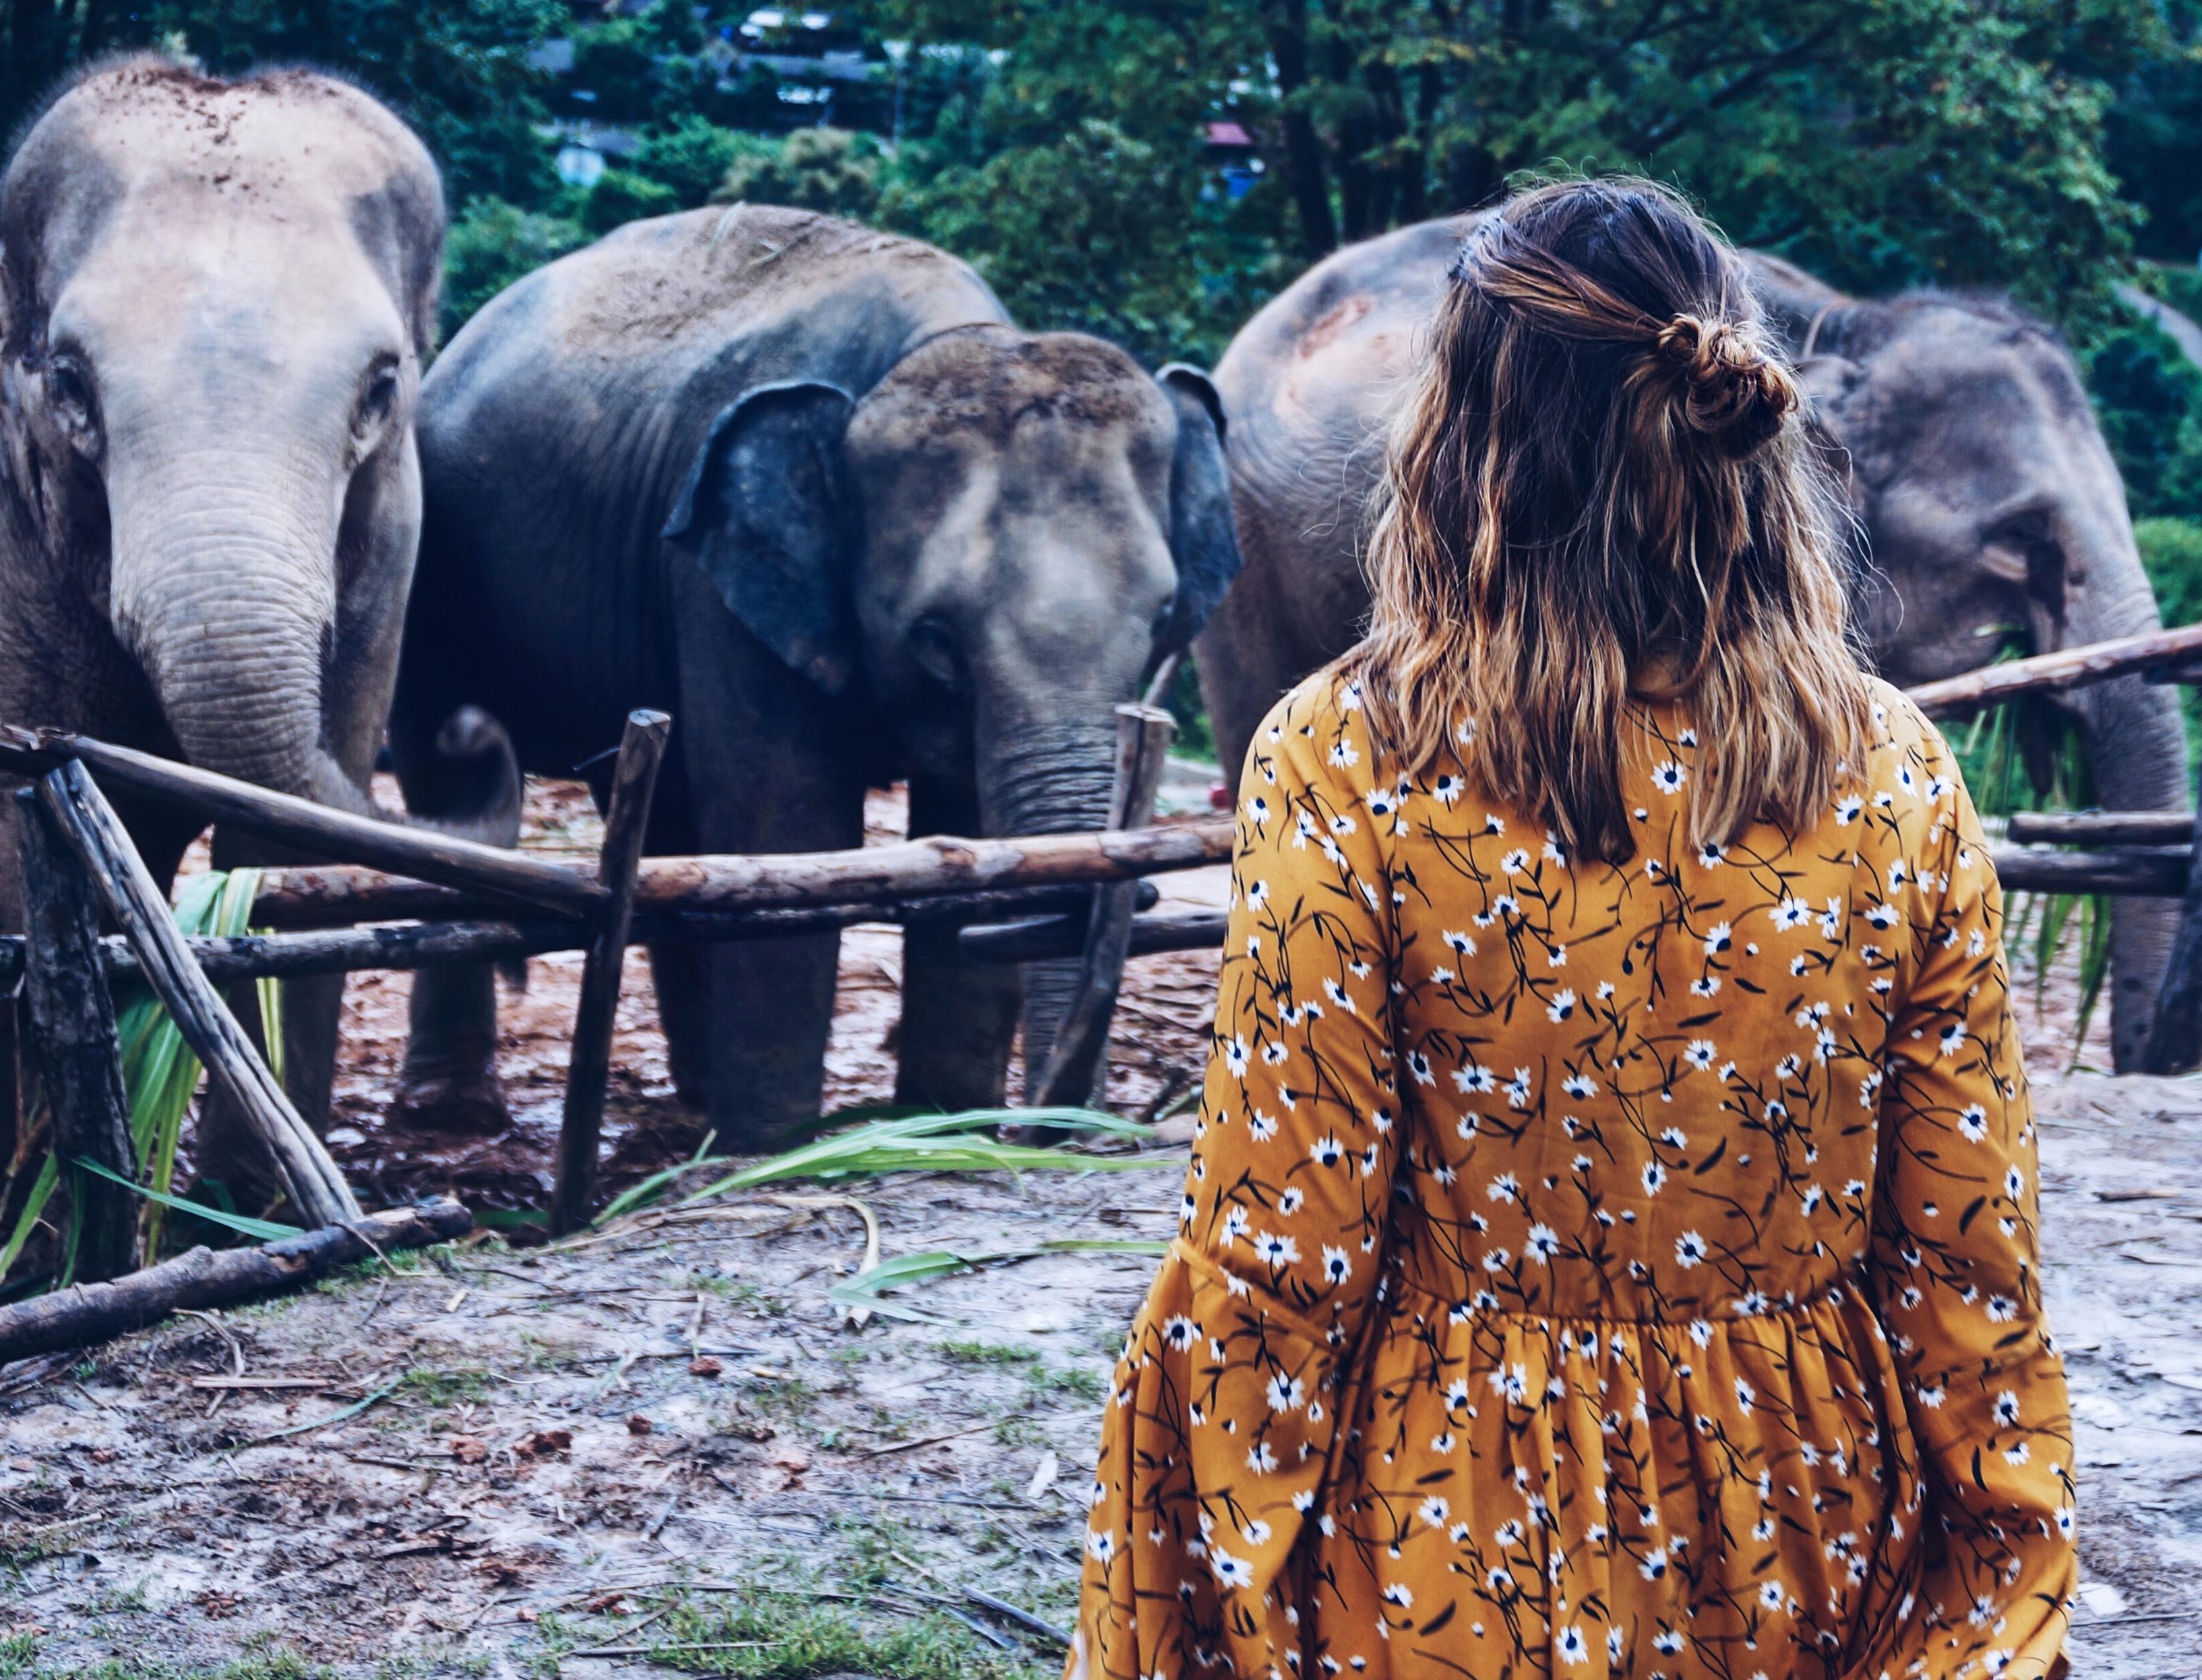 Elefantencamp in Chiang Mai, ethisches Camp, Thailand, Frau vor Elefanten